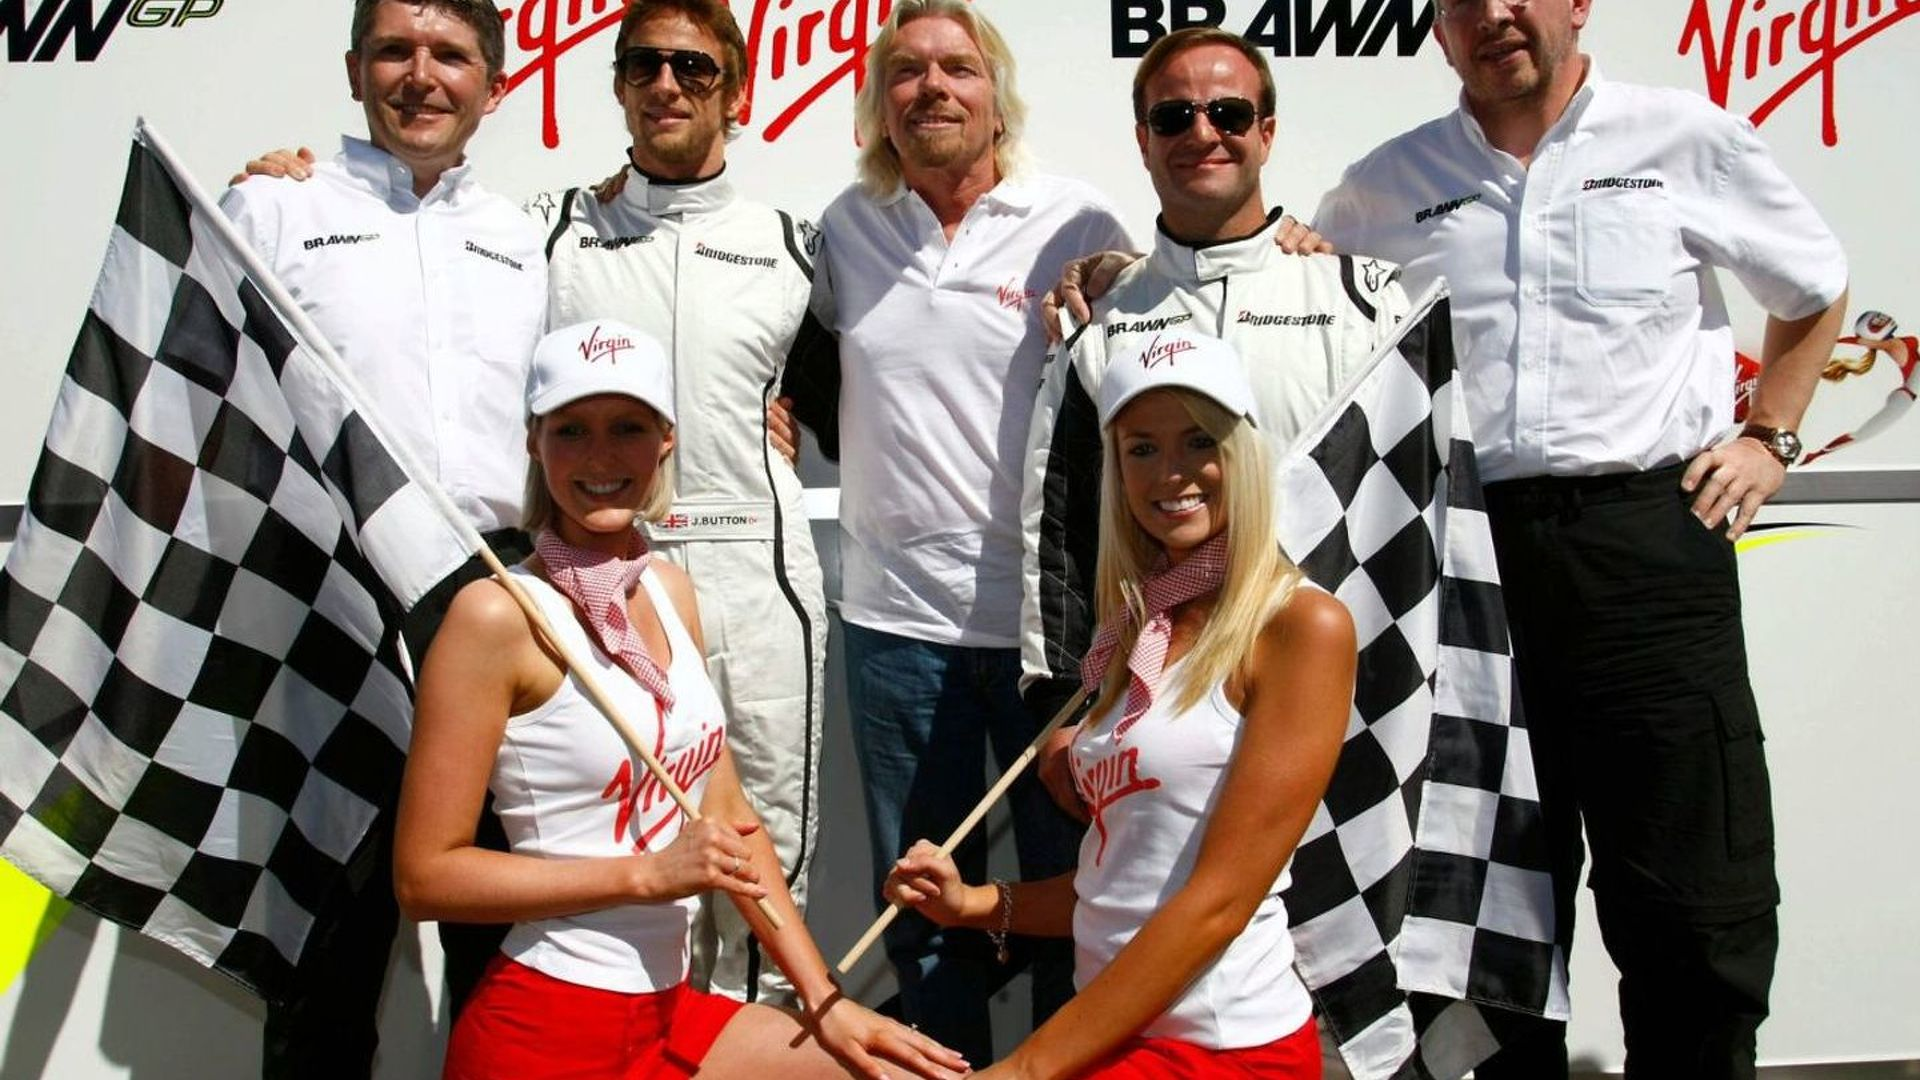 Virgin coverage worth $60m with Brawn